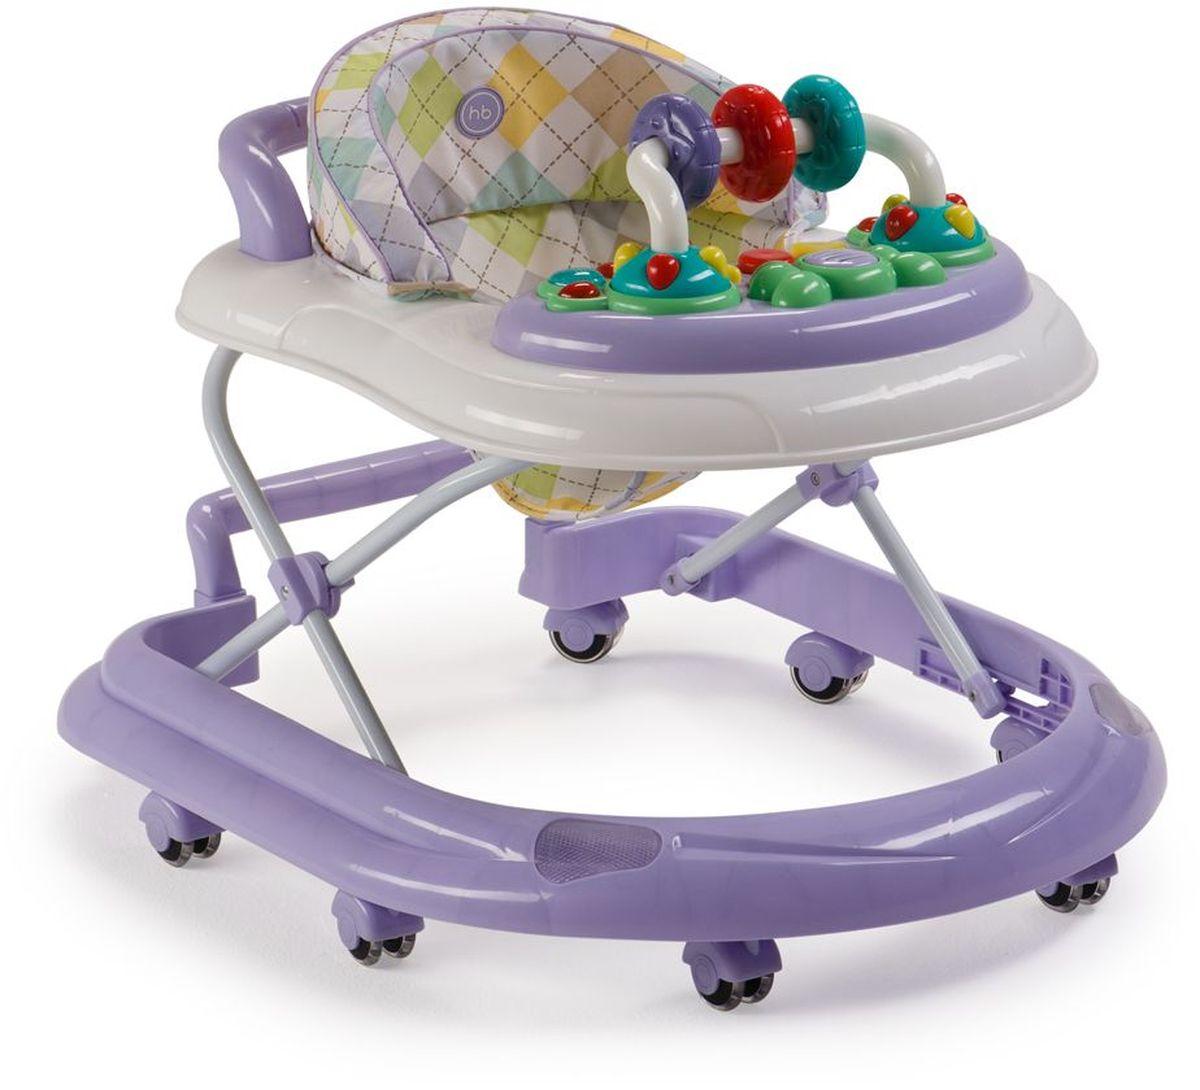 Happy Baby Ходунки Smiley V2 цвет лиловый -  Ходунки, прыгунки, качалки